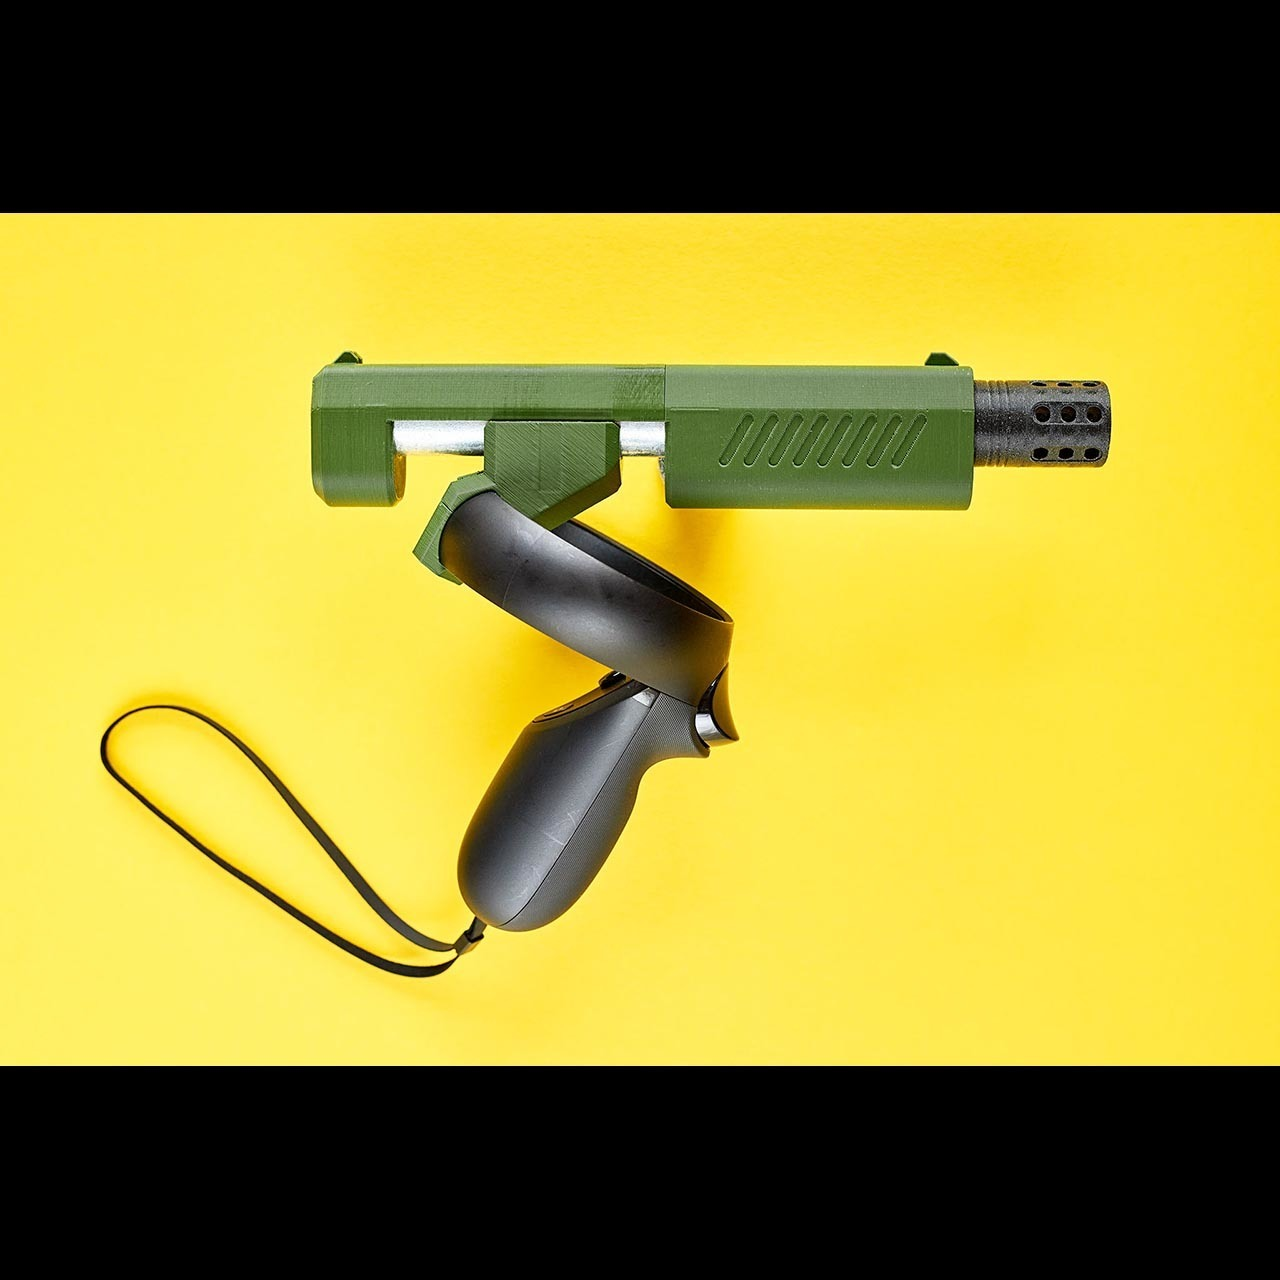 pistol_vr_001.jpg Download free STL file PISTOL VR magnetic gunstock Oculus Rift-S Quest • 3D printer template, danielschweinert